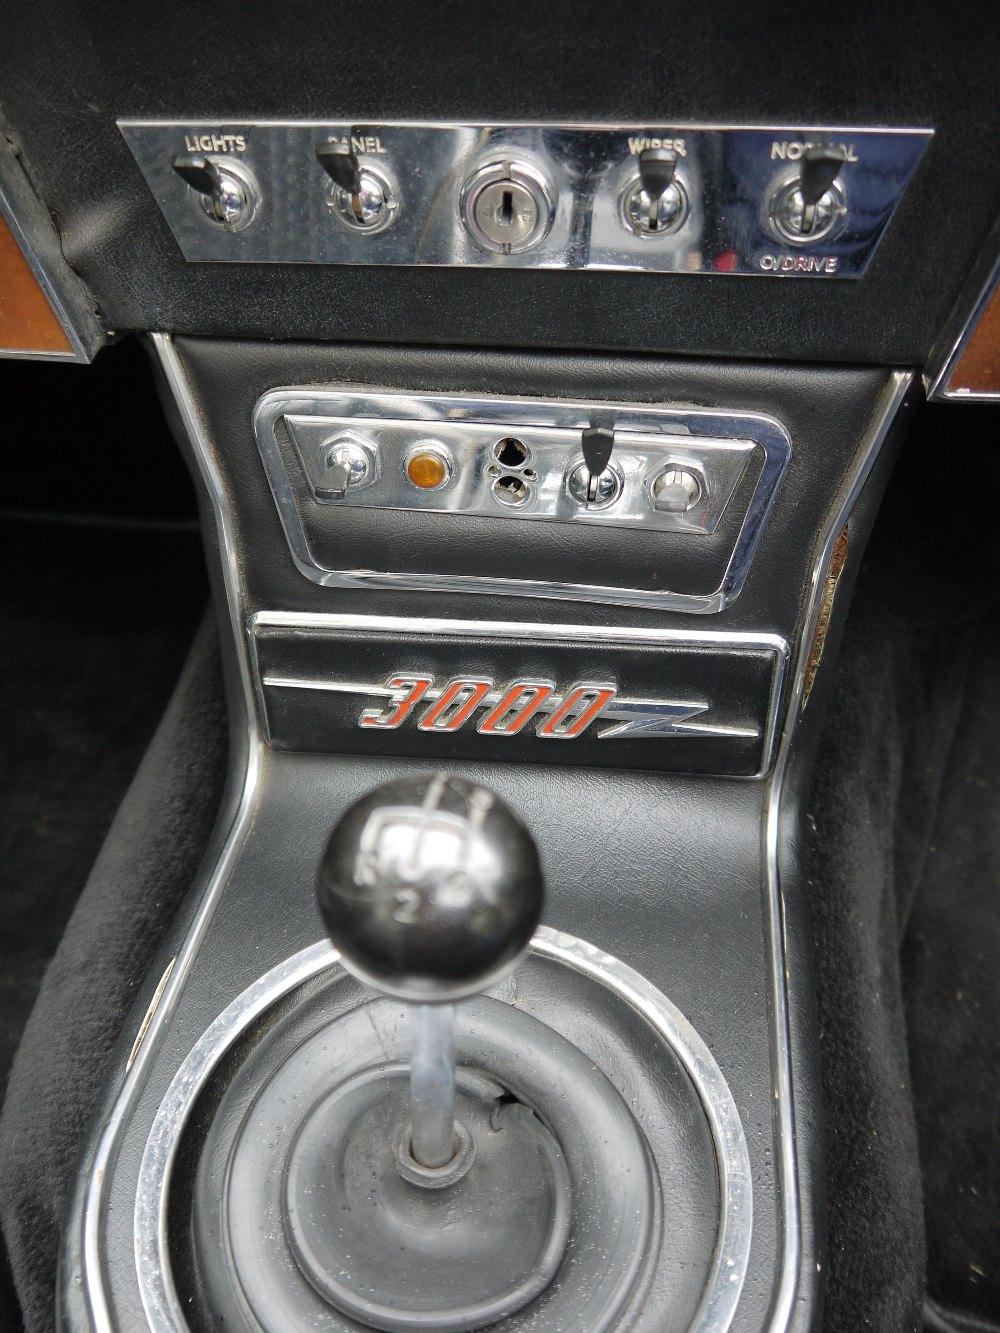 1967 AUSTIN-HEALEY 3000 MARK III Registration Number: LTA 126F Chassis Number: H-BJ8-41730 - Image 21 of 21